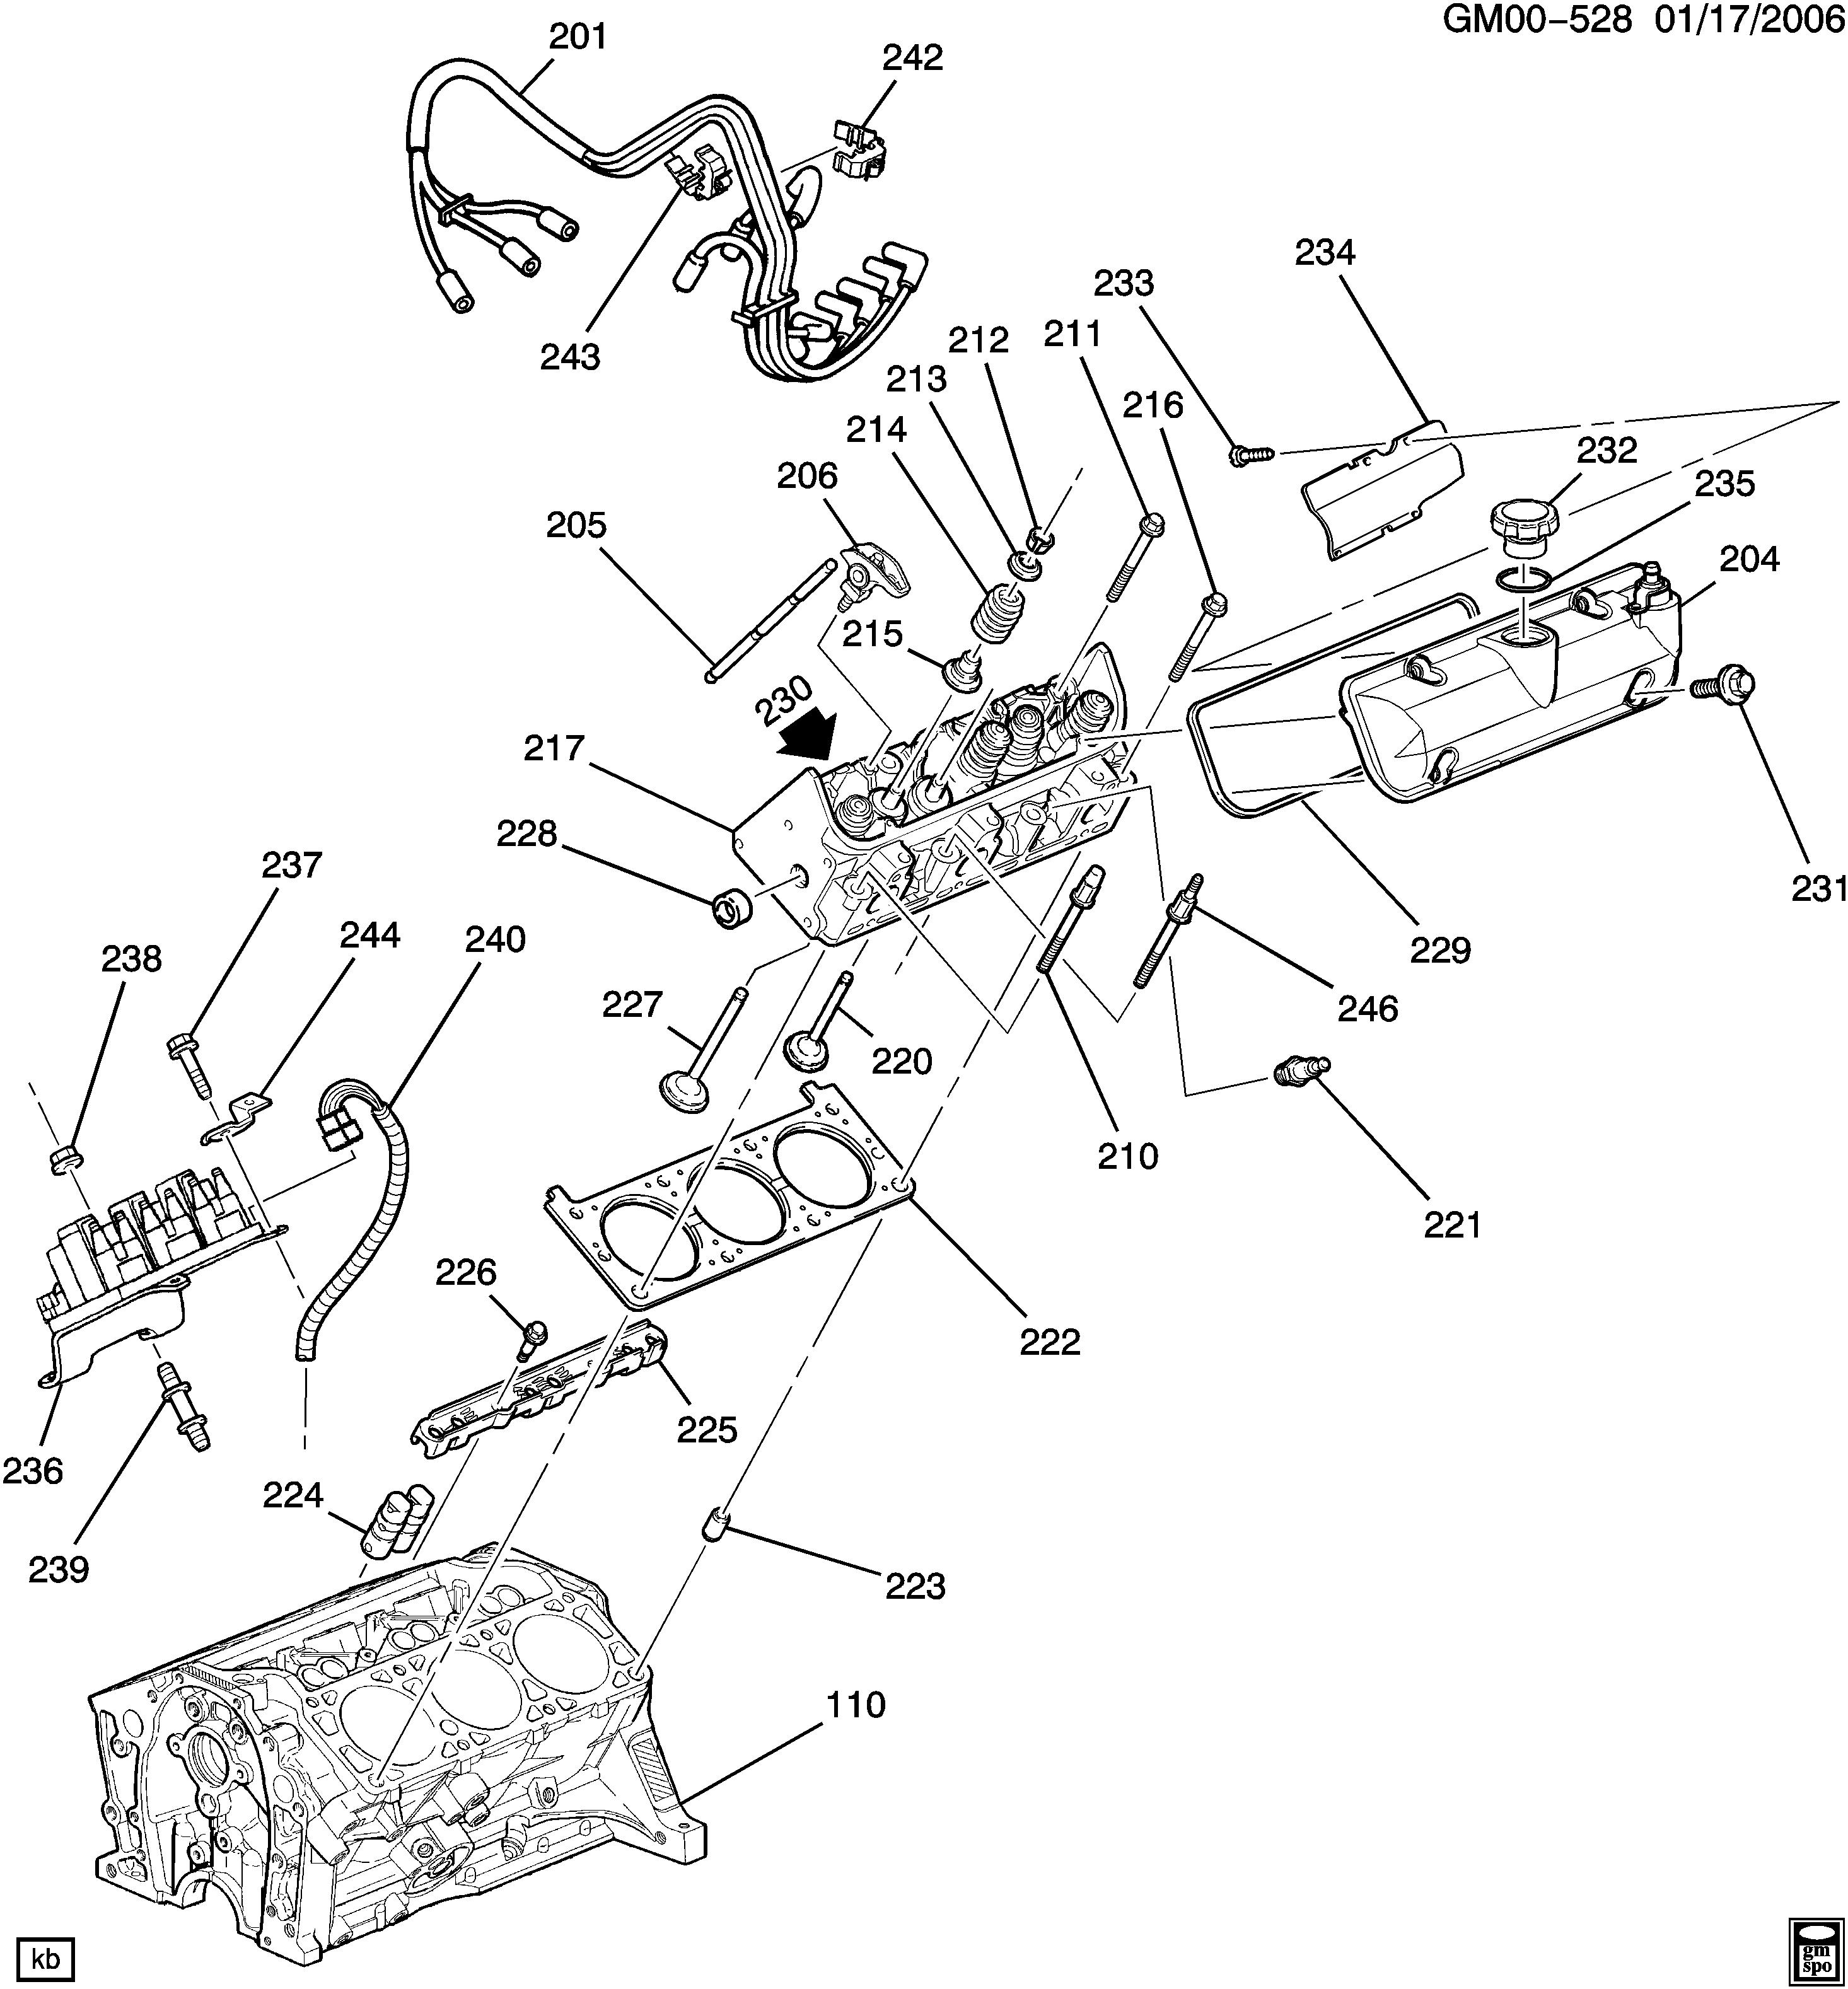 1995 Chevy Lumina Engine Diagram Swm Rv Dish Wiring Diagram On Ai 2000 Yenpancane Jeanjaures37 Fr